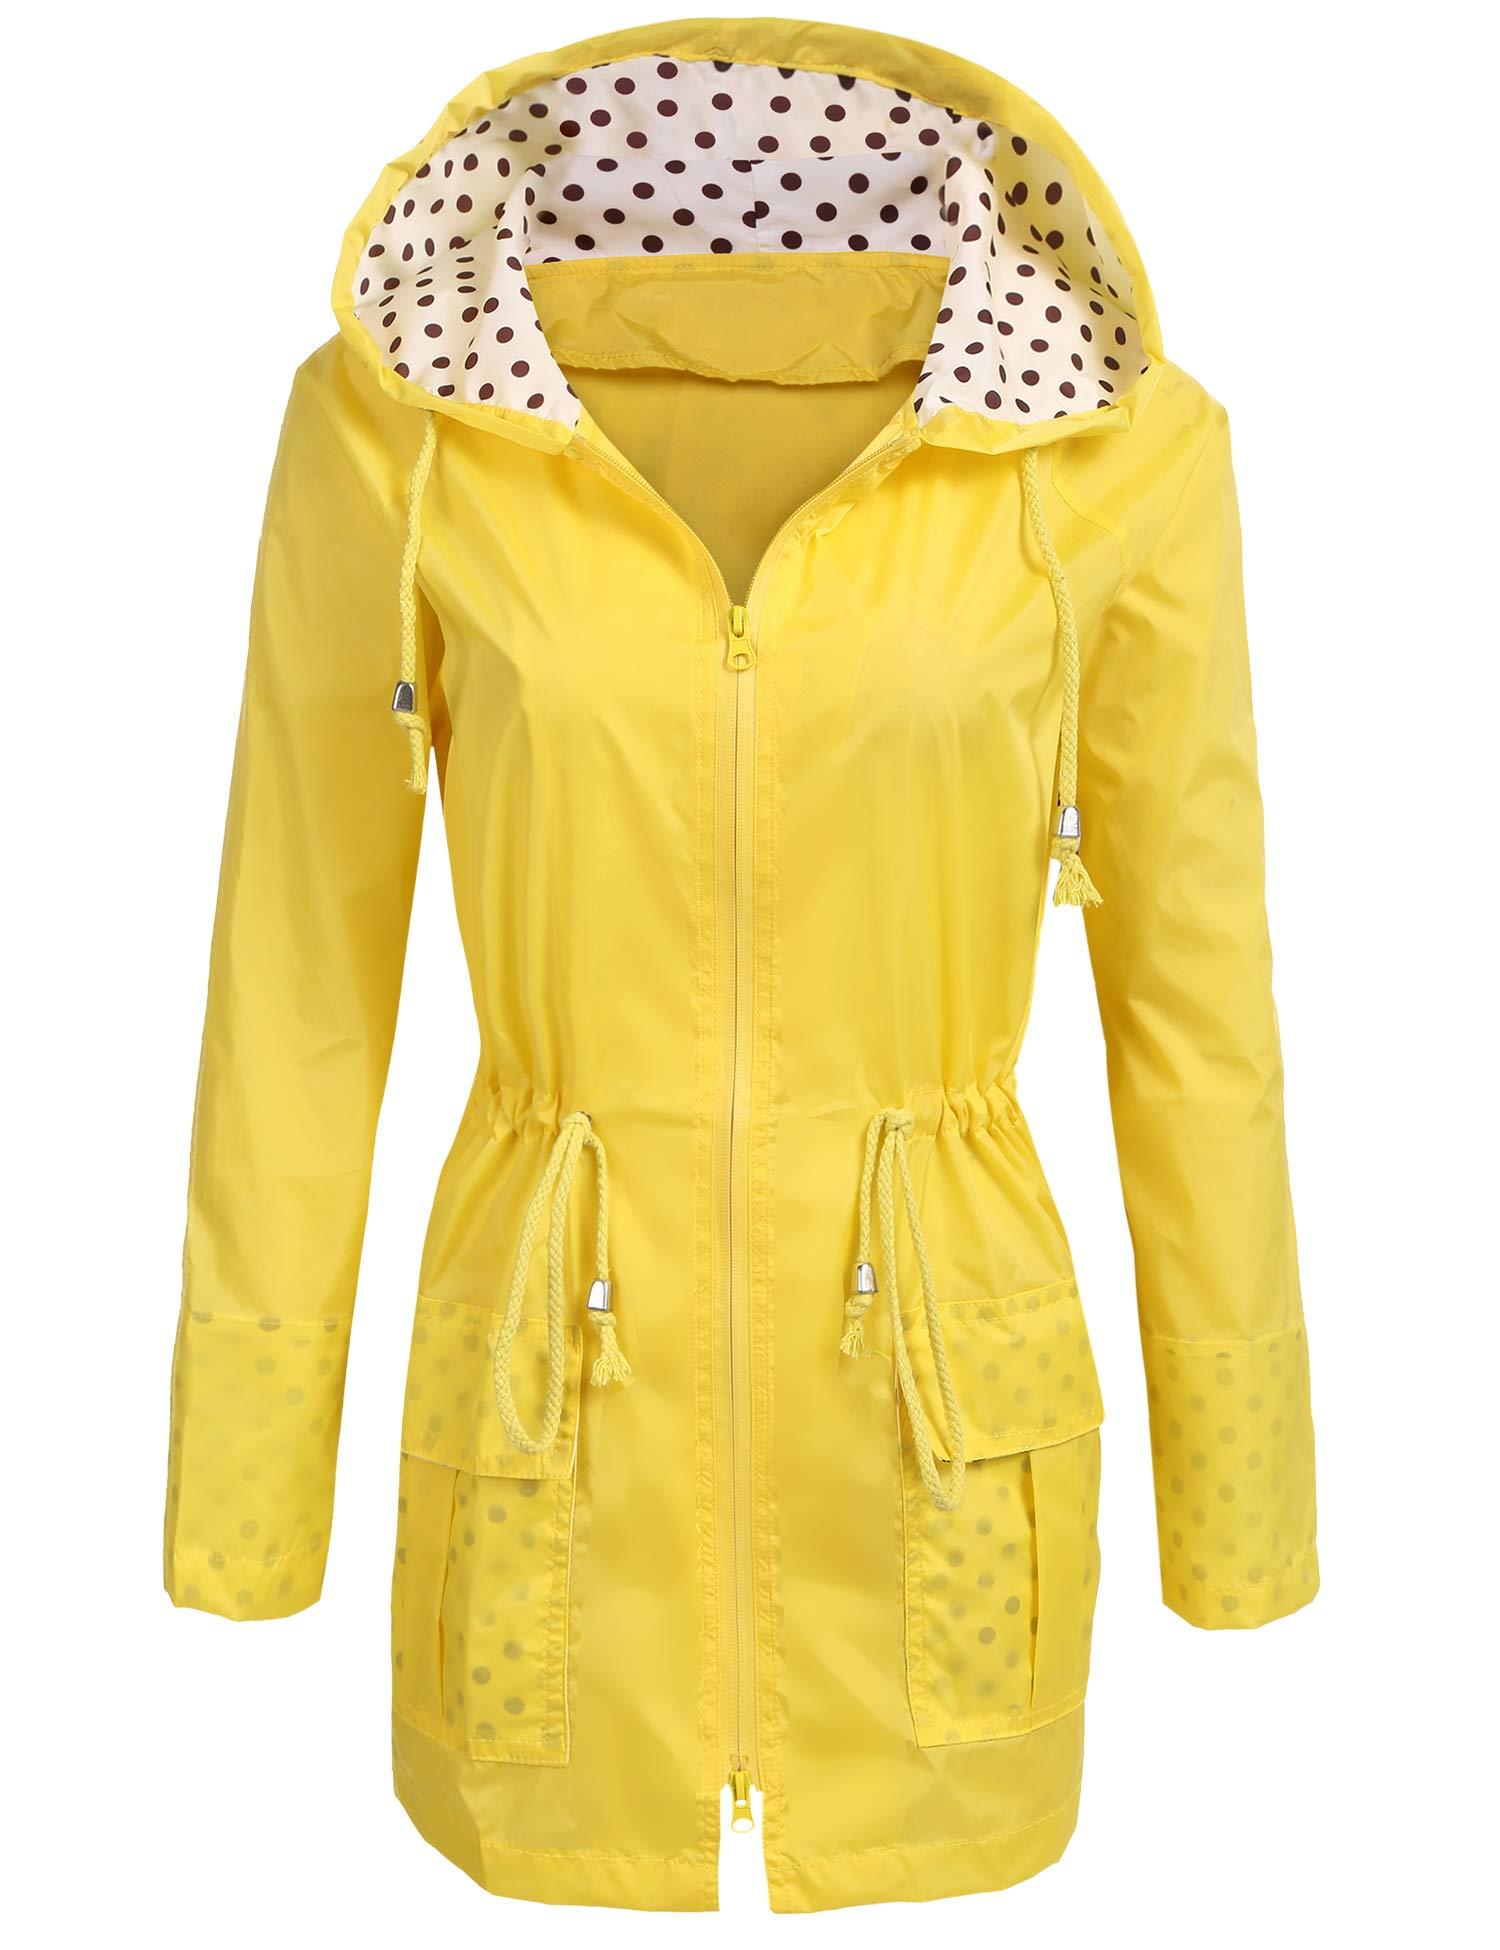 Unibelle Waterproof Lightweight Rain Jacket Active Outdoor Hooded Raincoat for Women, Yellow, Large by UNibelle